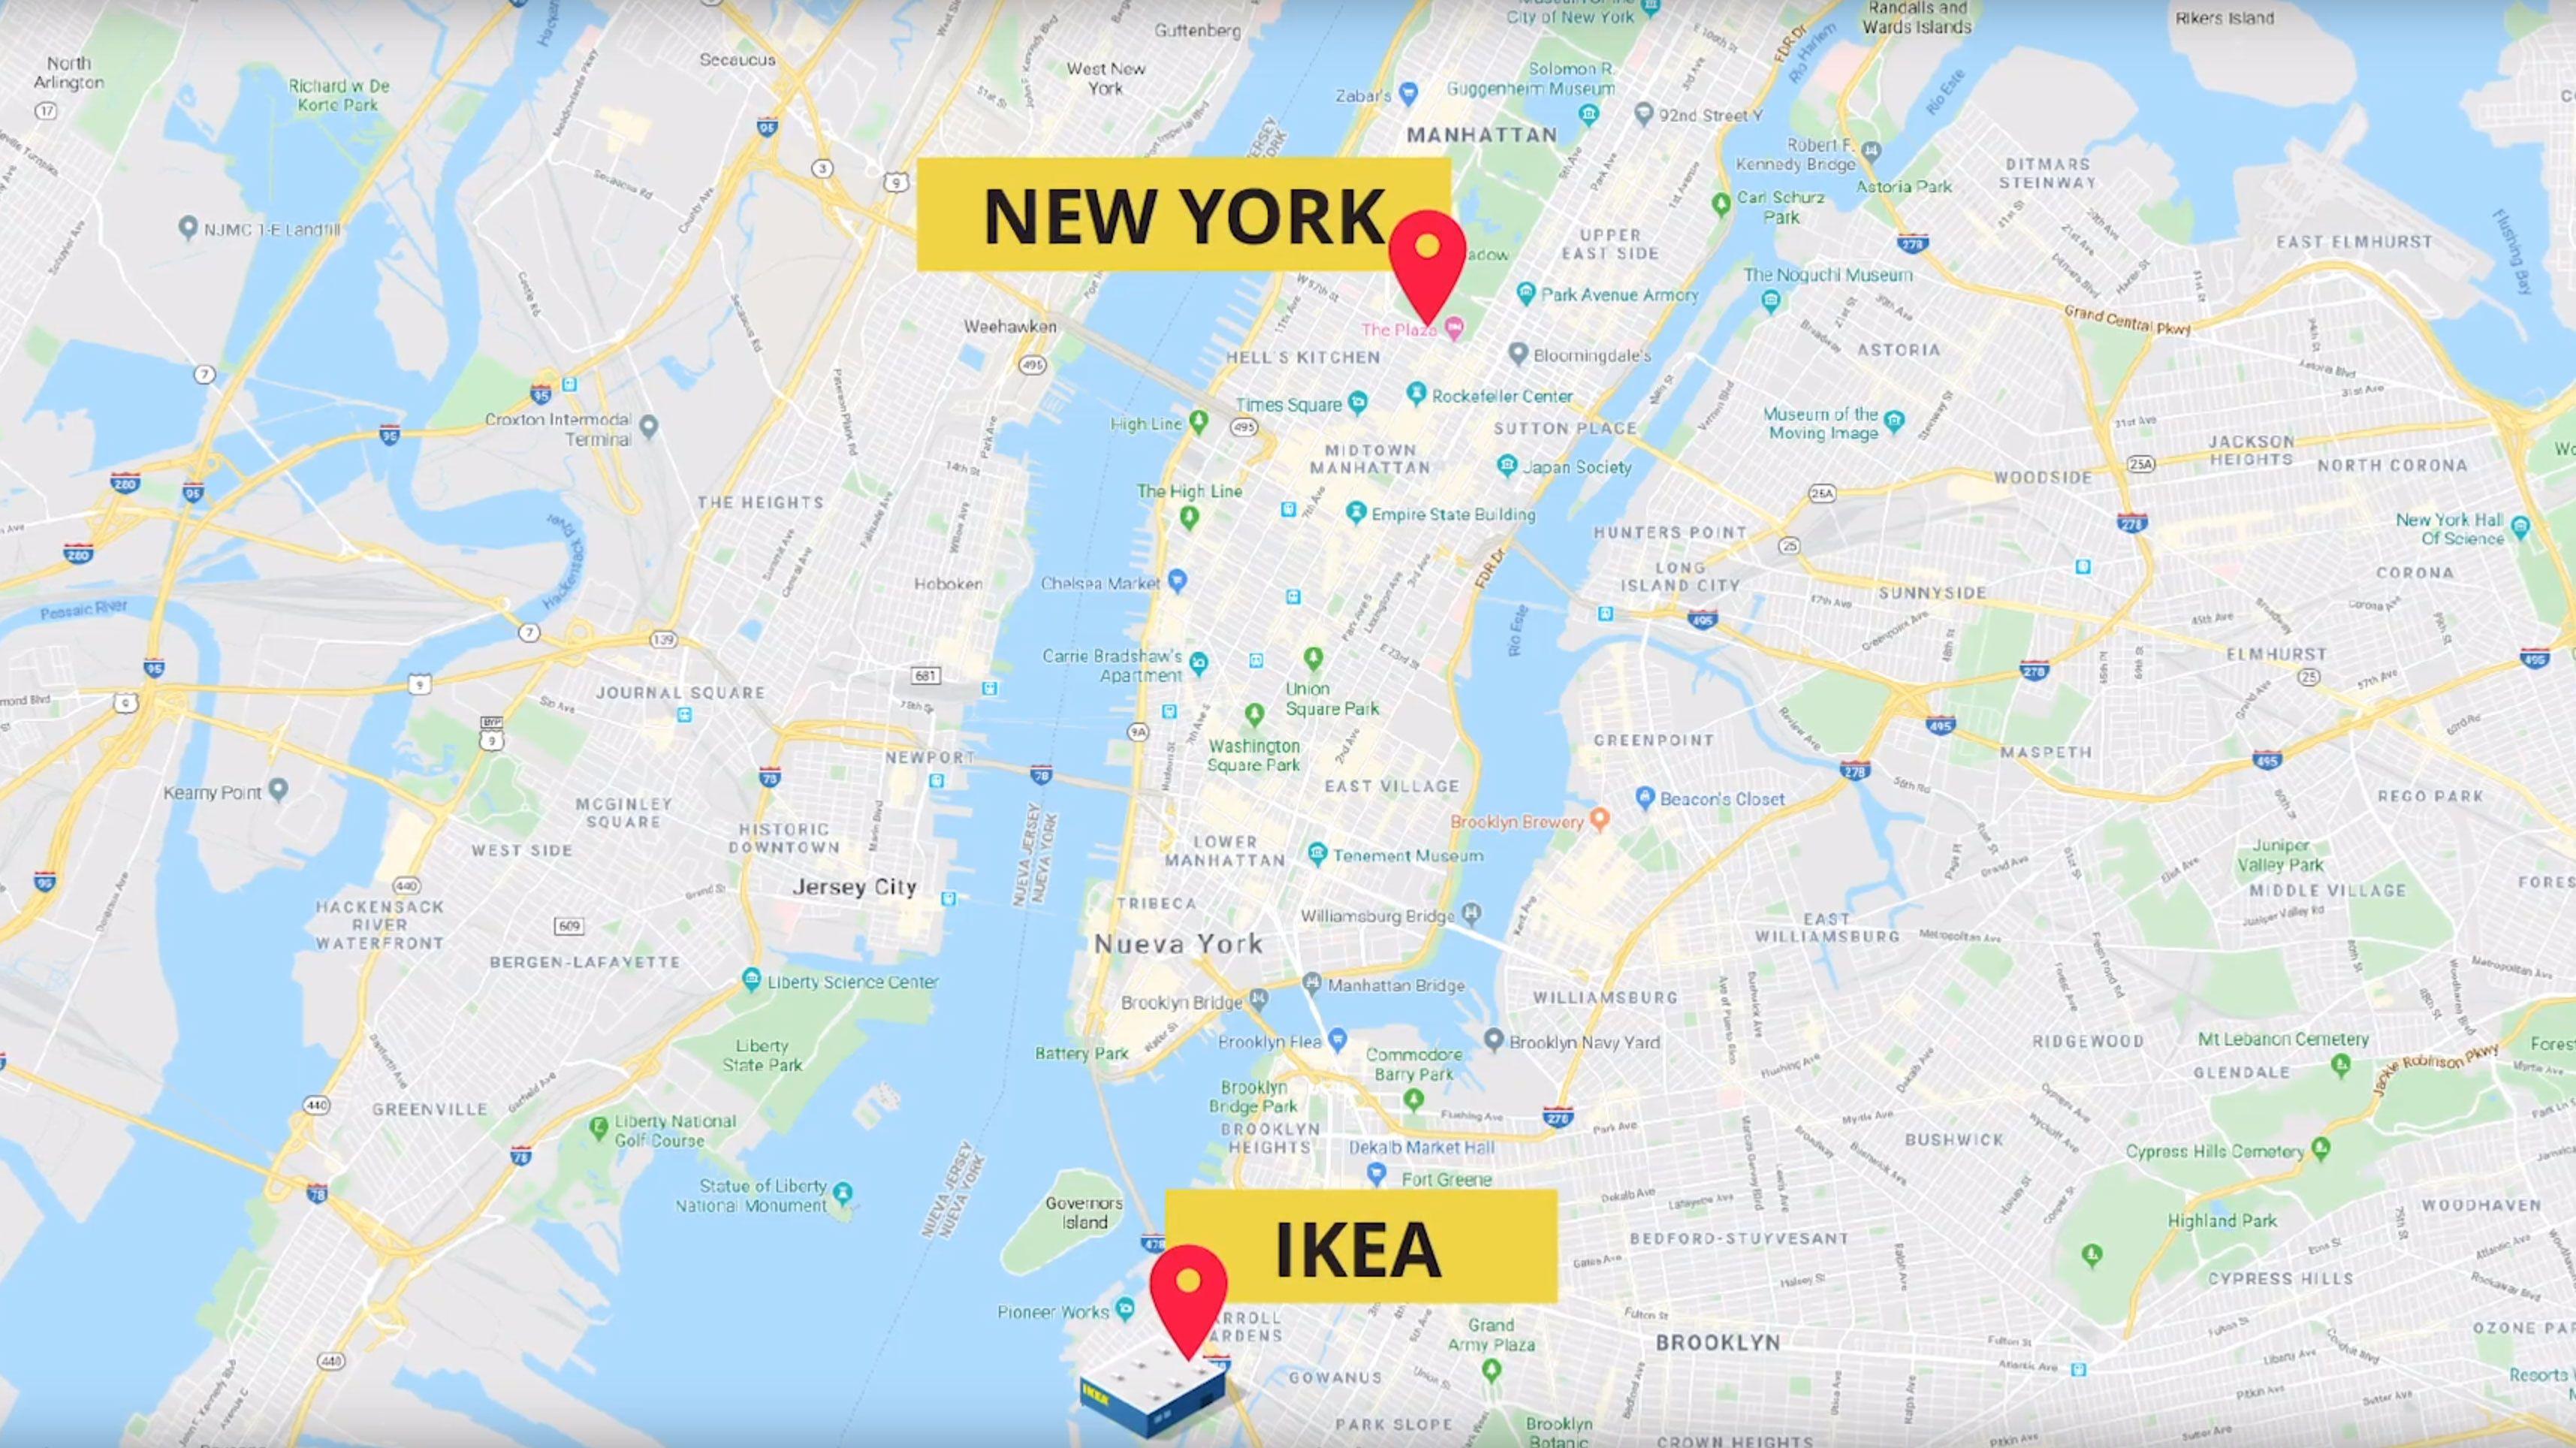 Ikea testet bonusordning med Google Maps